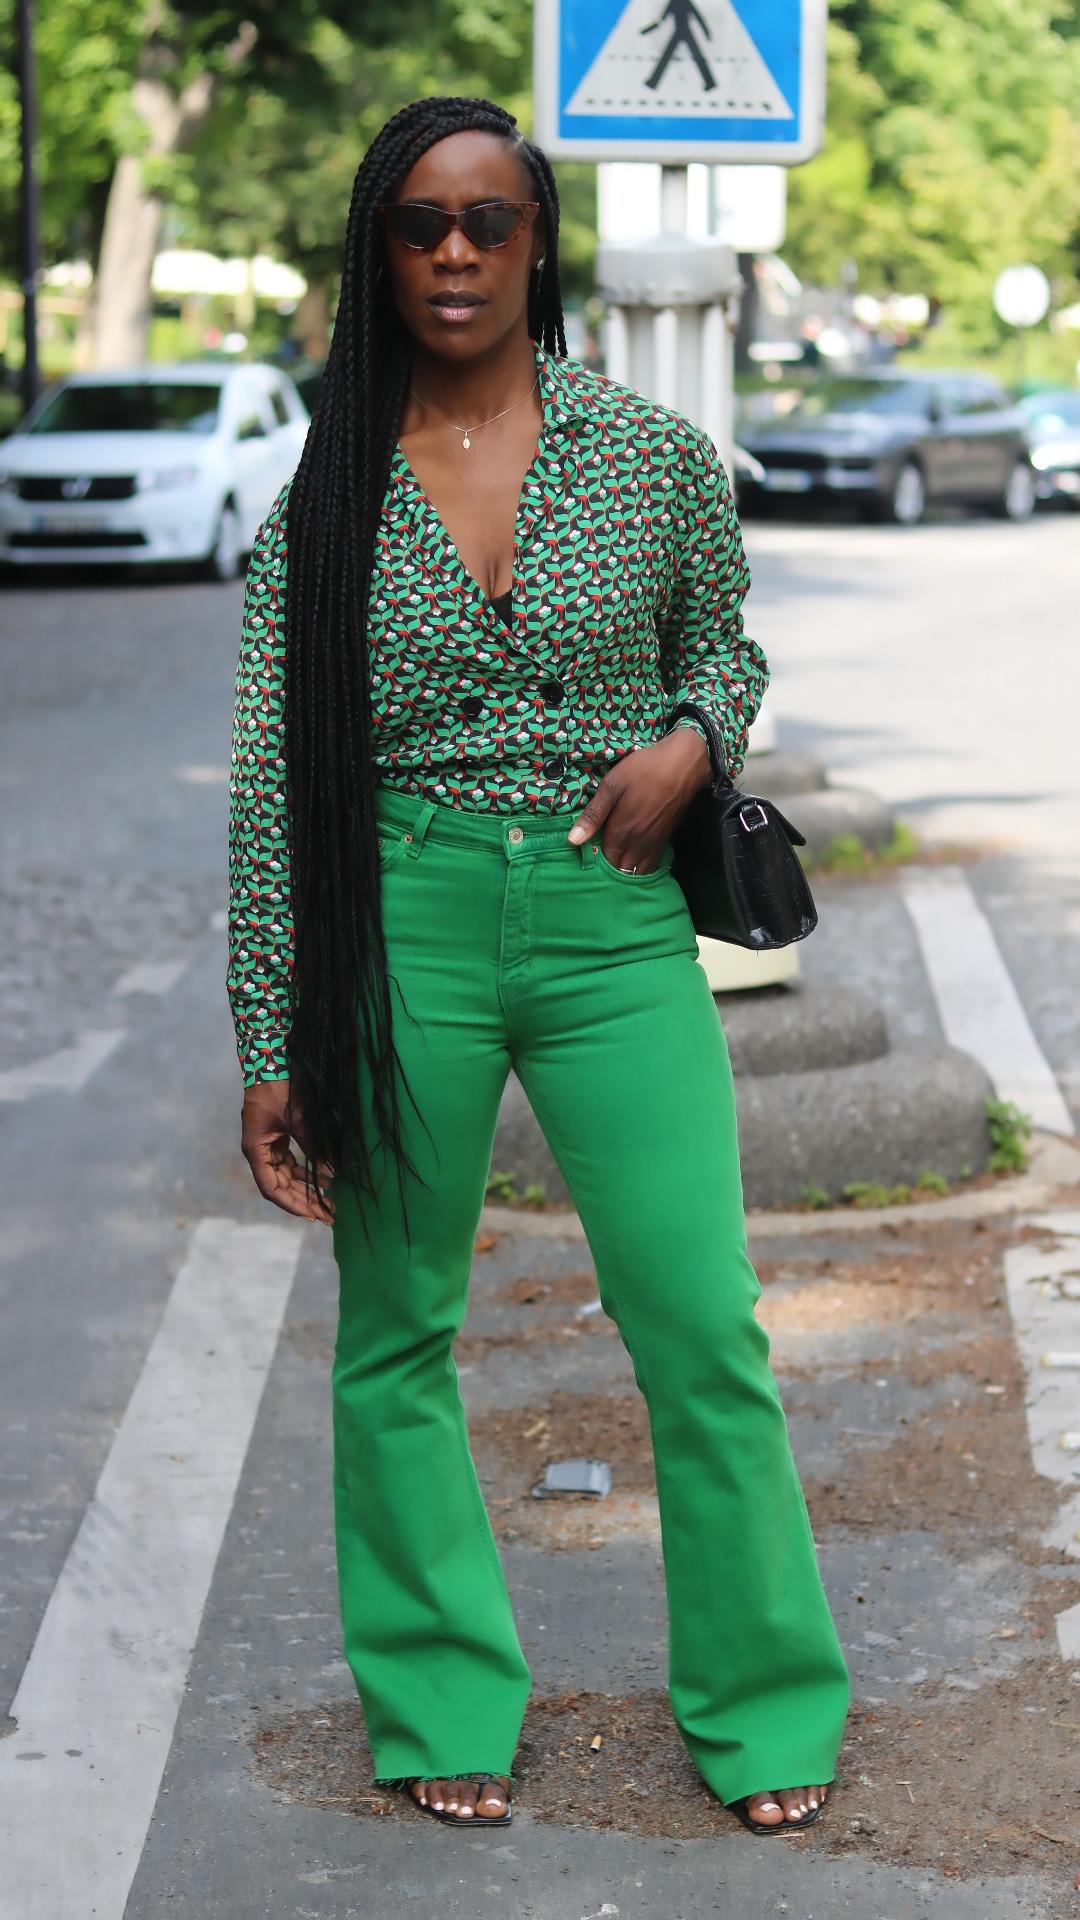 Green peace💚